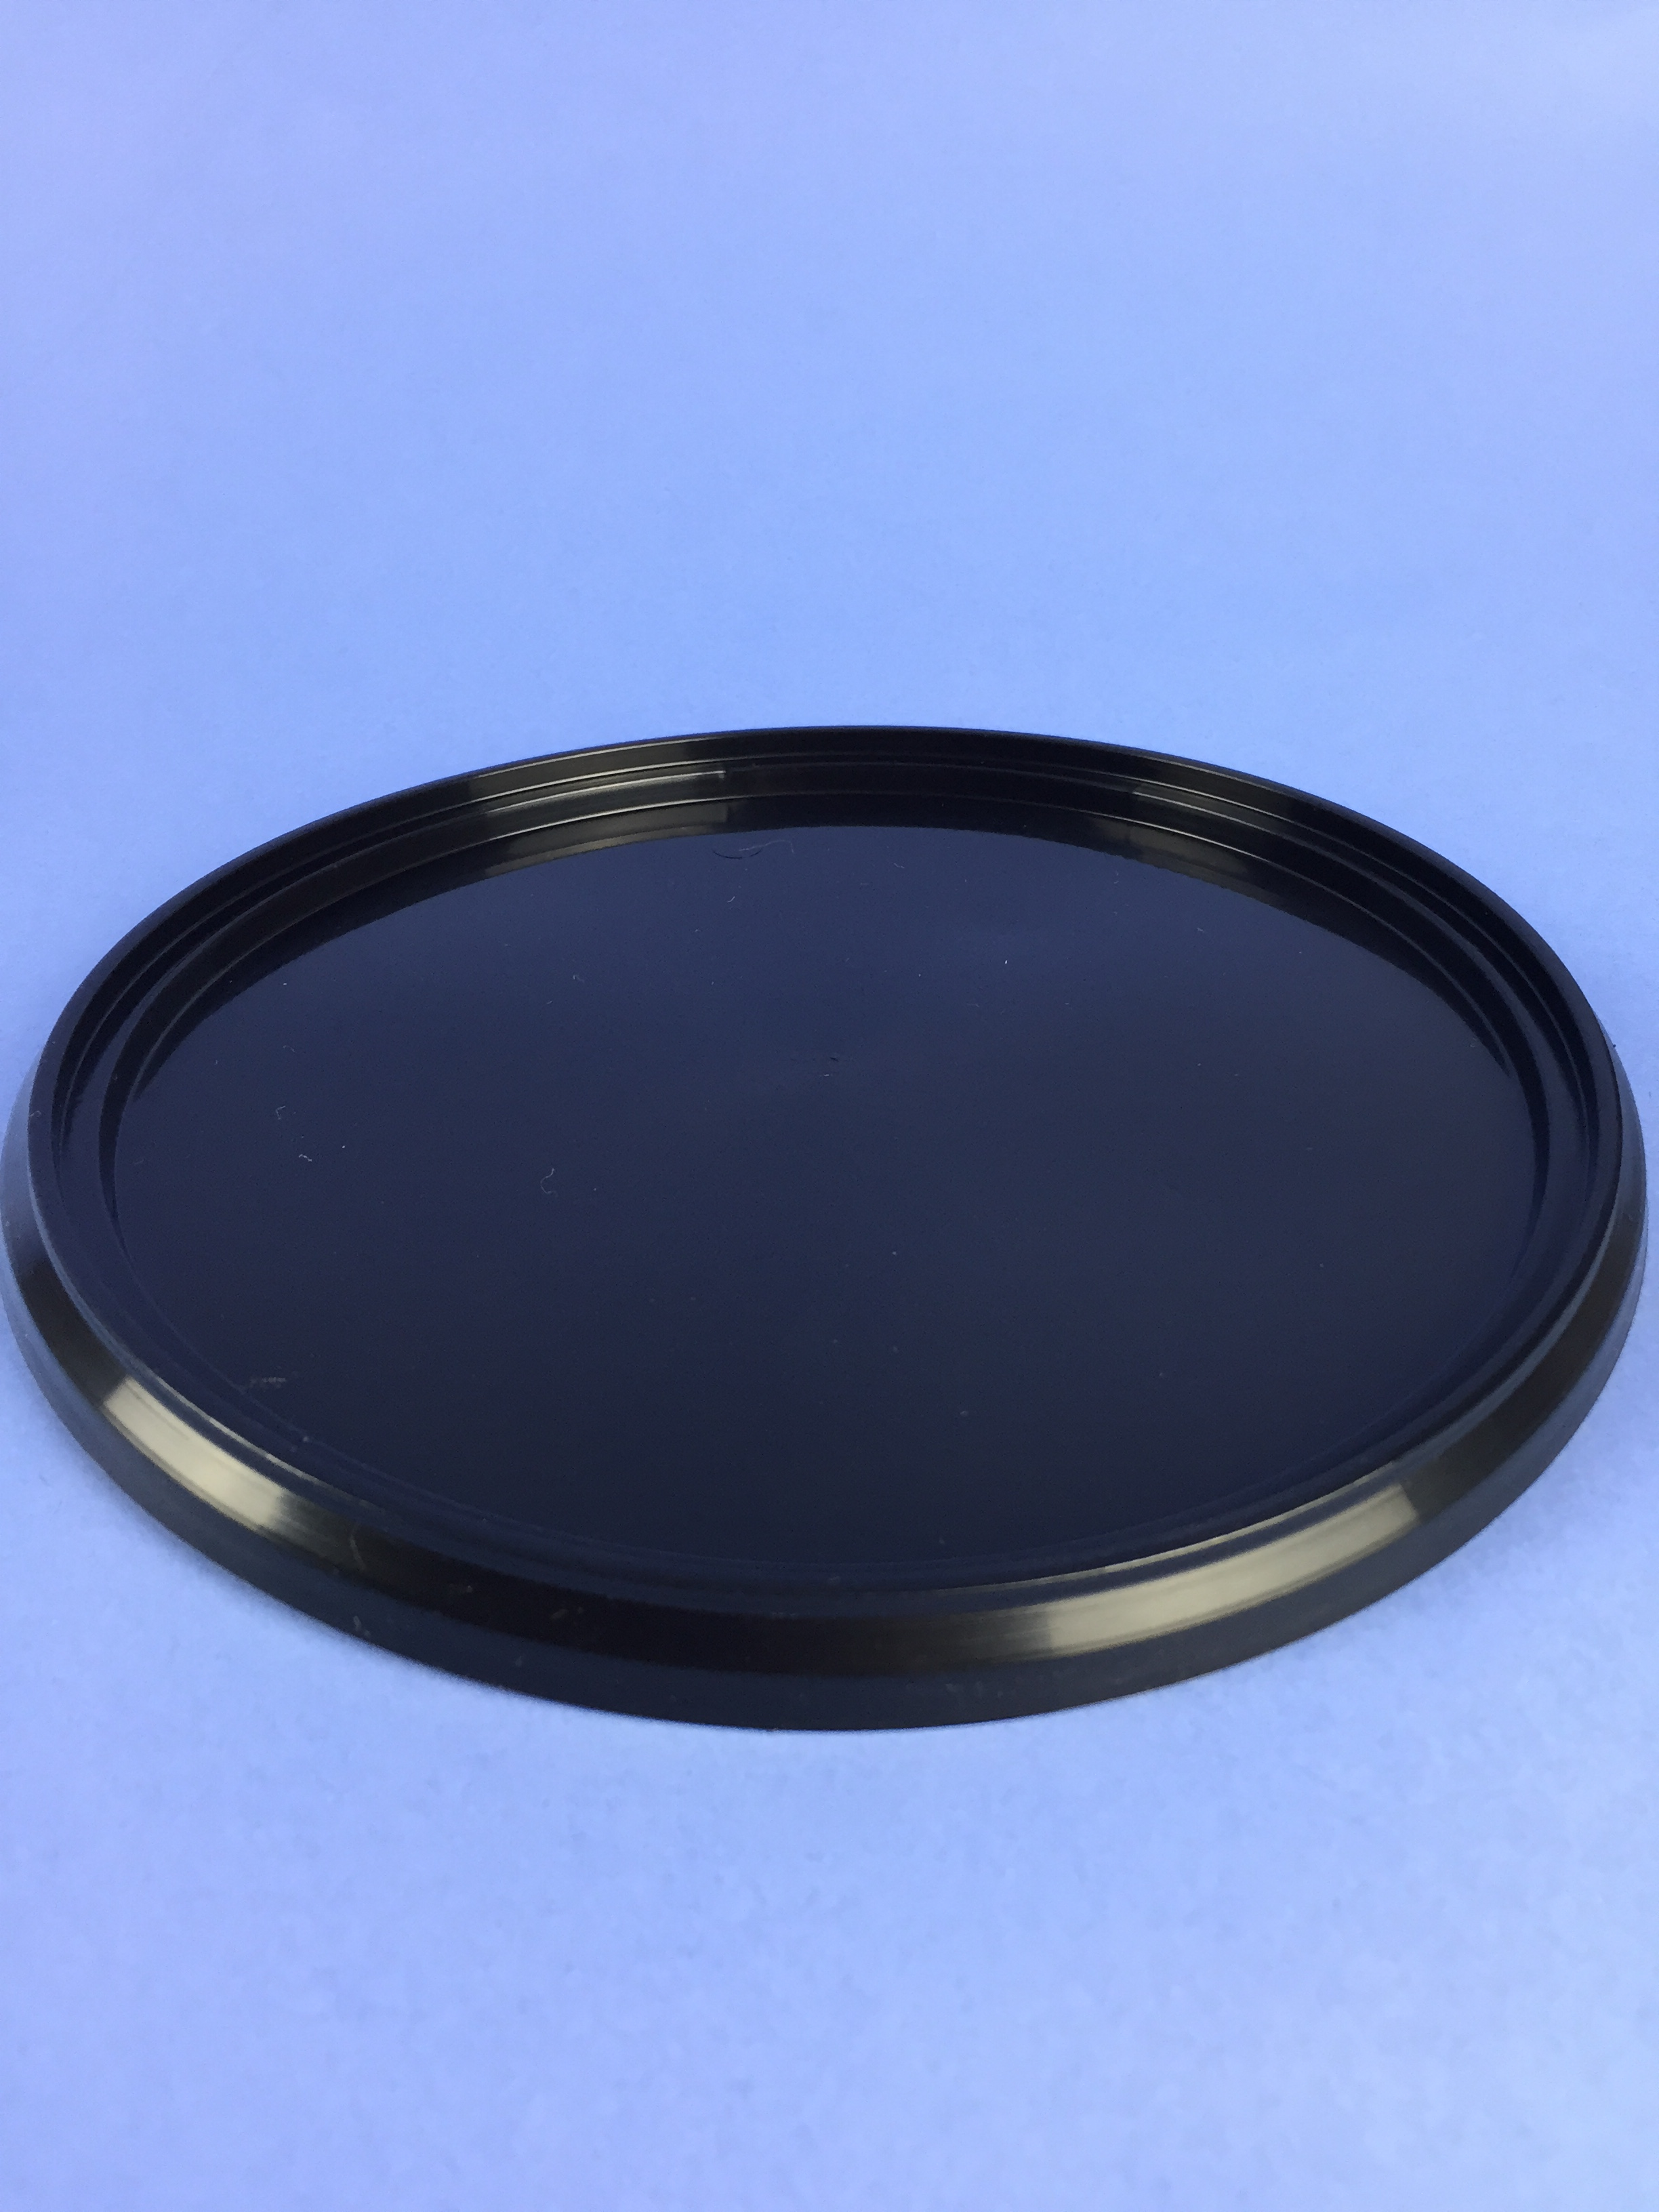 Clear 3 Litre Bucket C W Plastic Handle Amp Tamper Evident